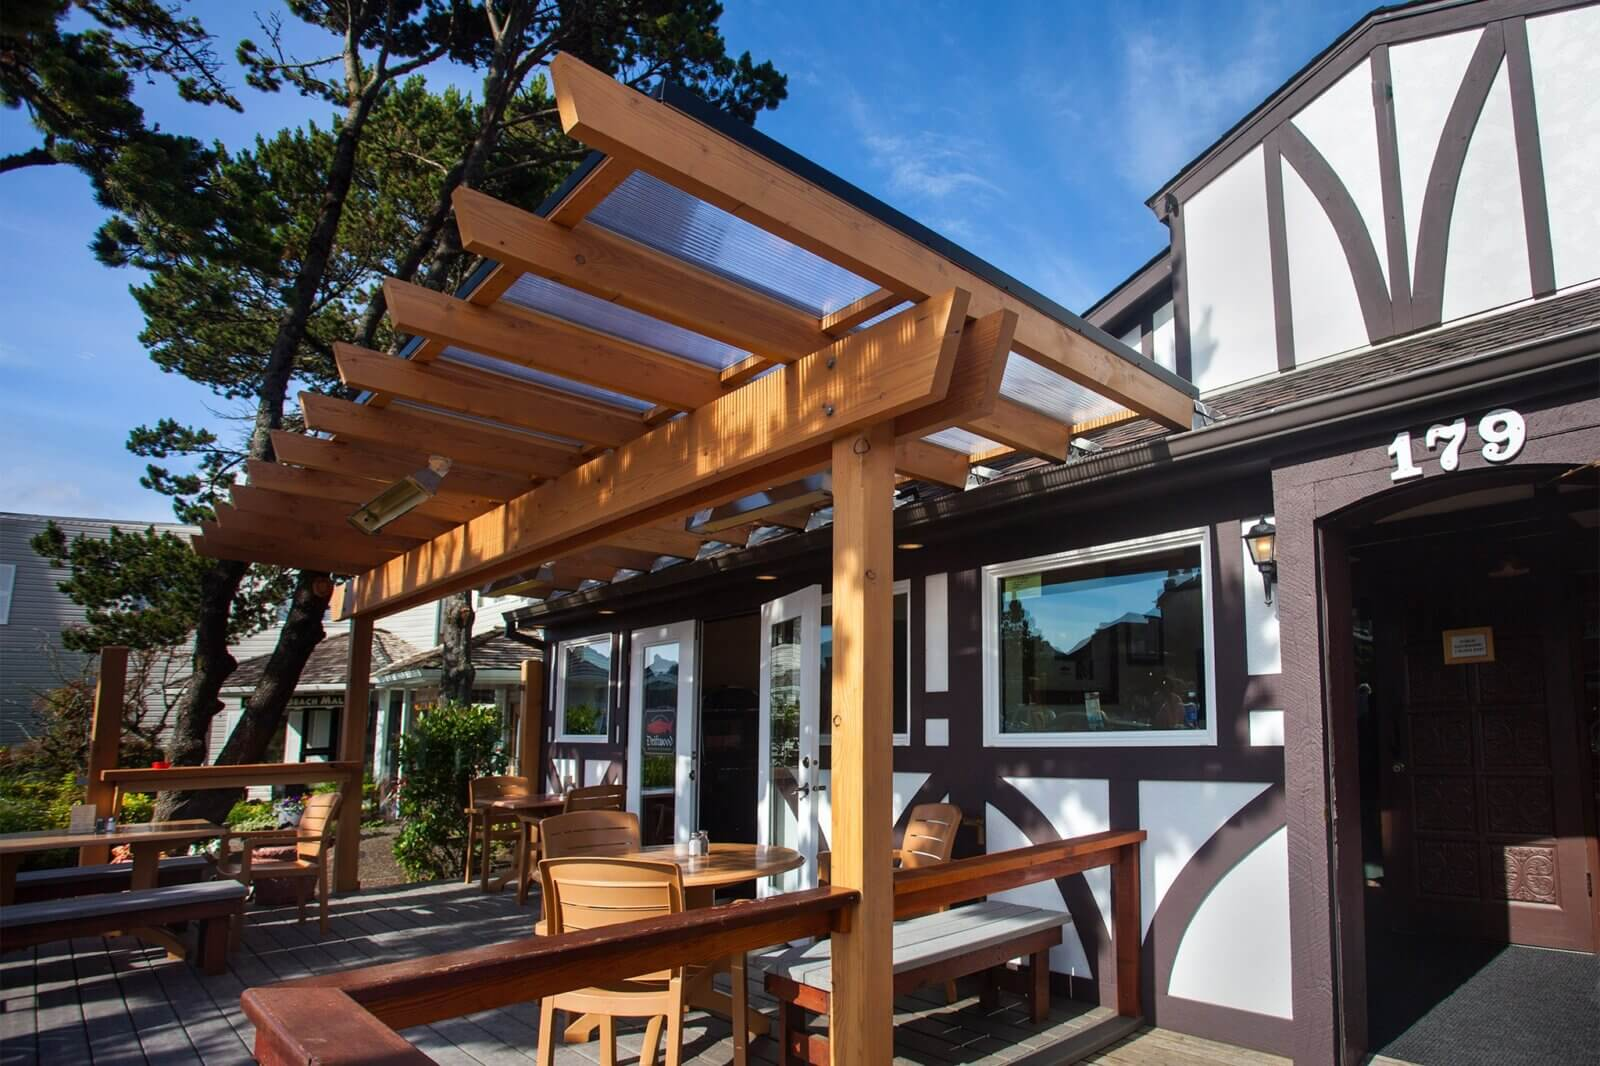 Driftwood restaurant in Cannon Beach, Oregon